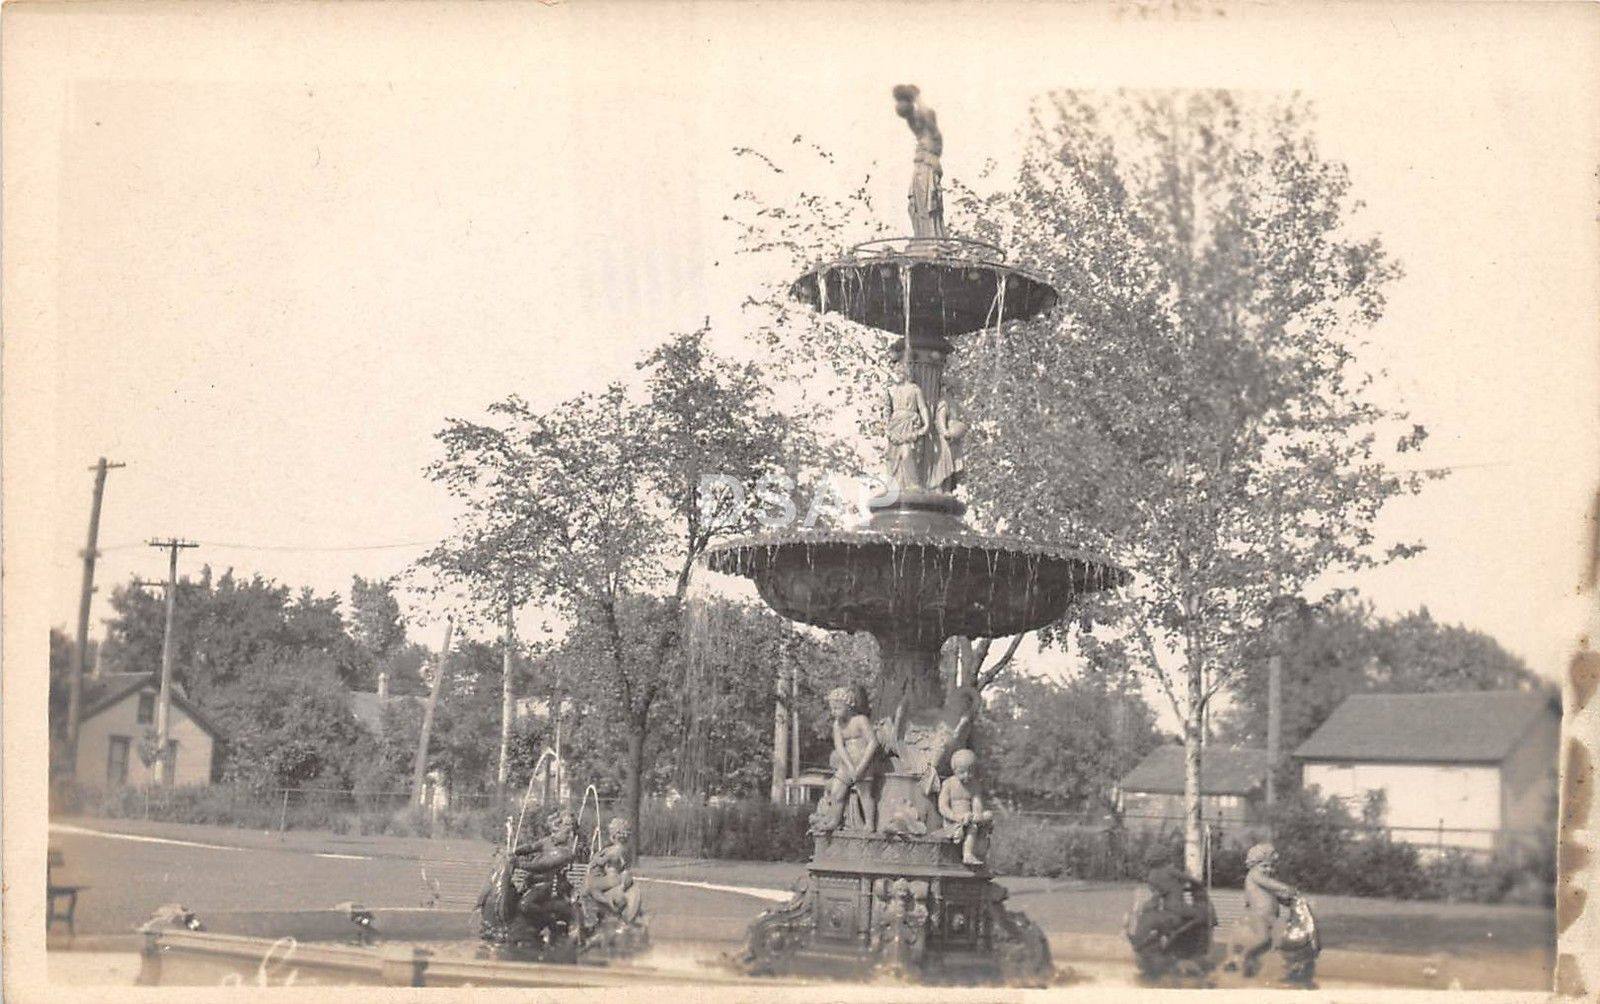 Studebaker Electric Fountain in Howard Park